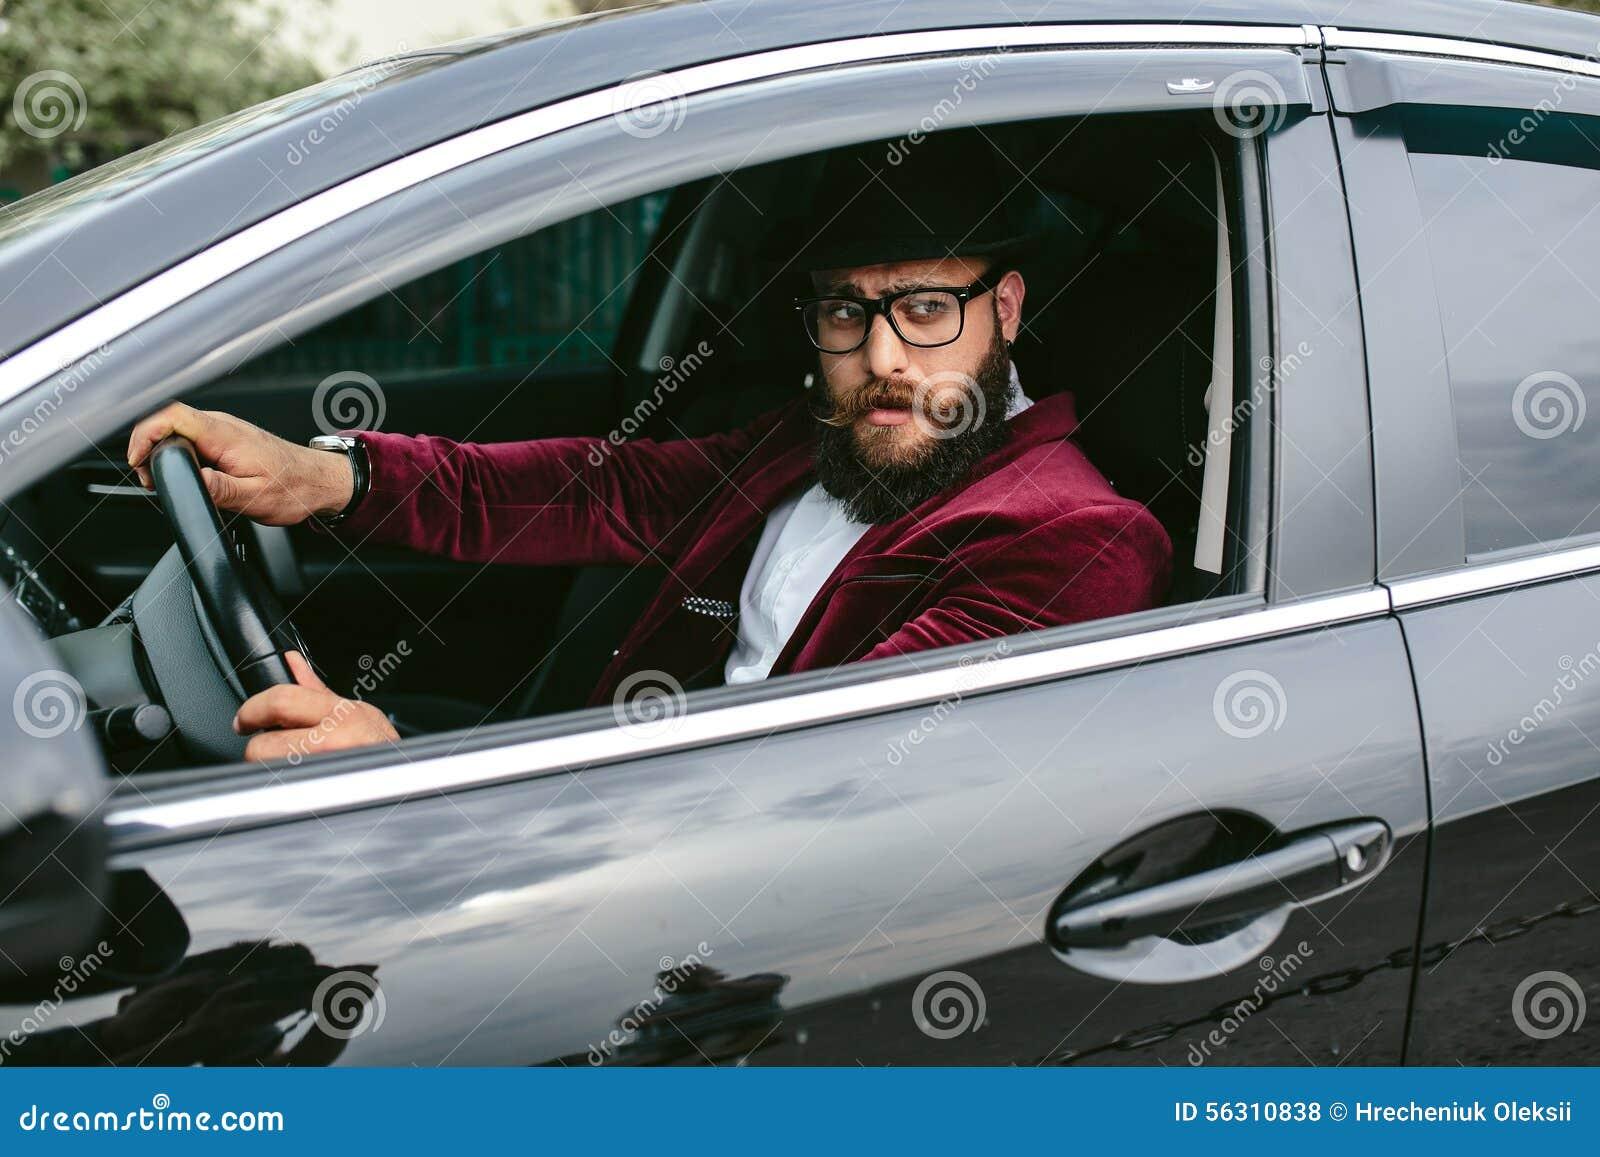 Man With Beard Driving A Car Stock Photo Image 56310838